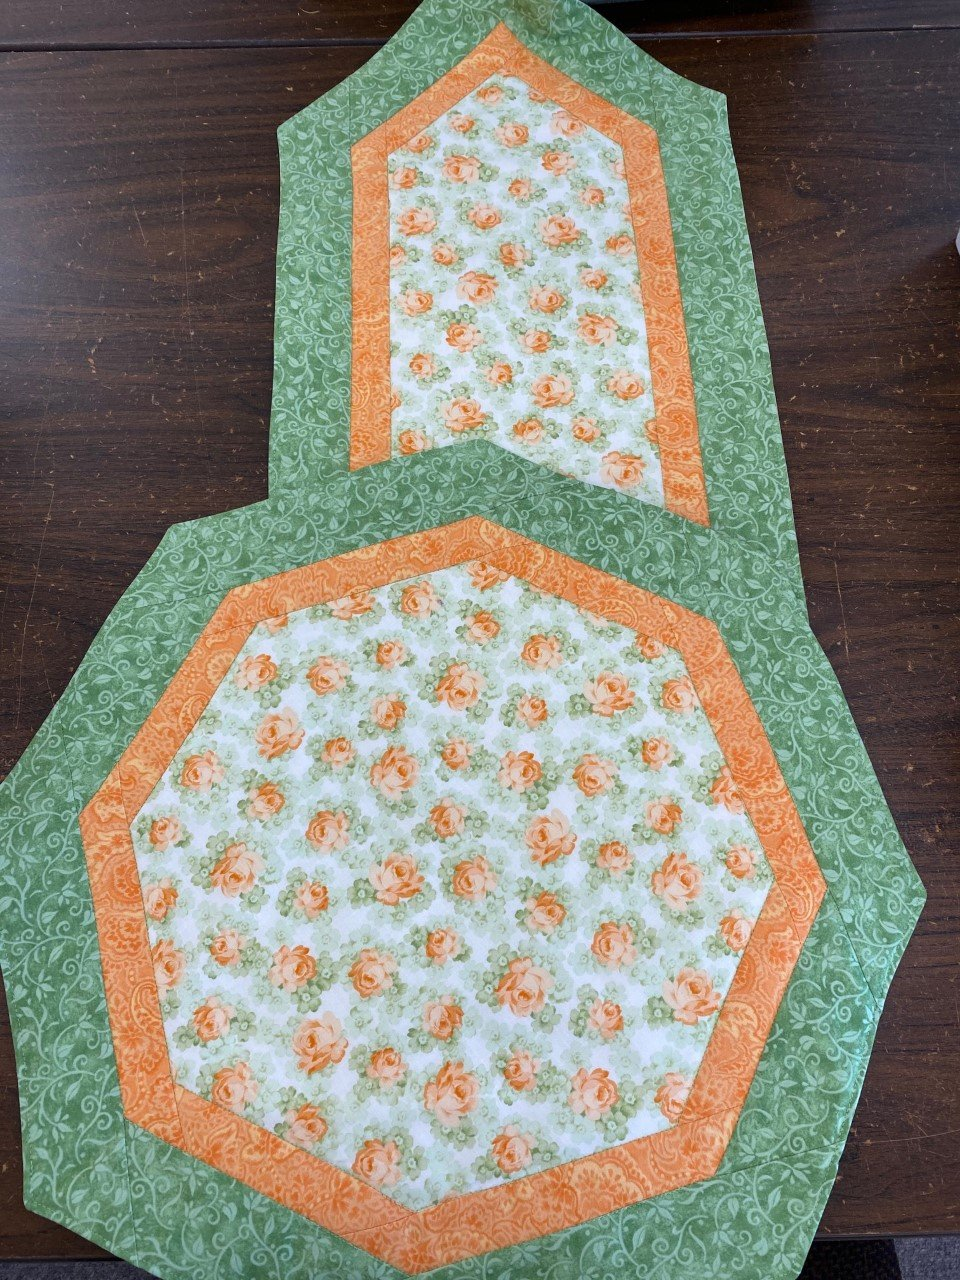 Floral Quick & Easy Table Topper/Runner Kit